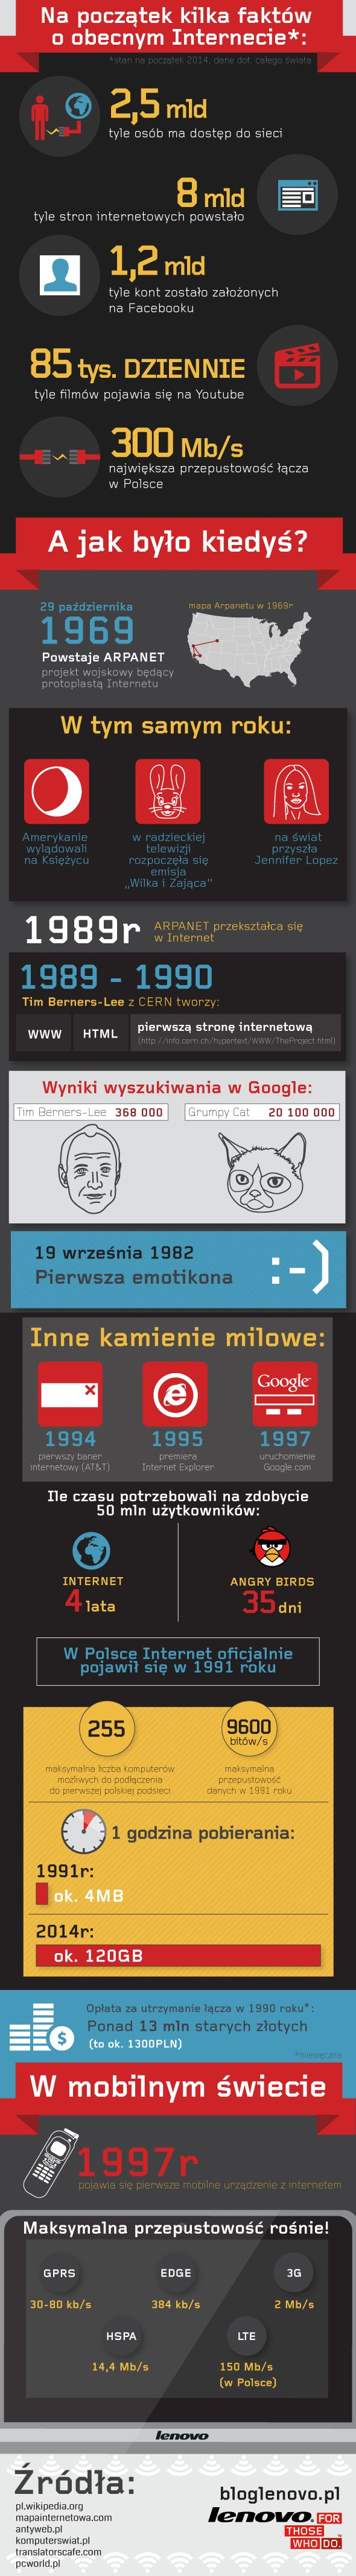 http://bloglenovo.pl/historia-internetu-pigulce-infografika/